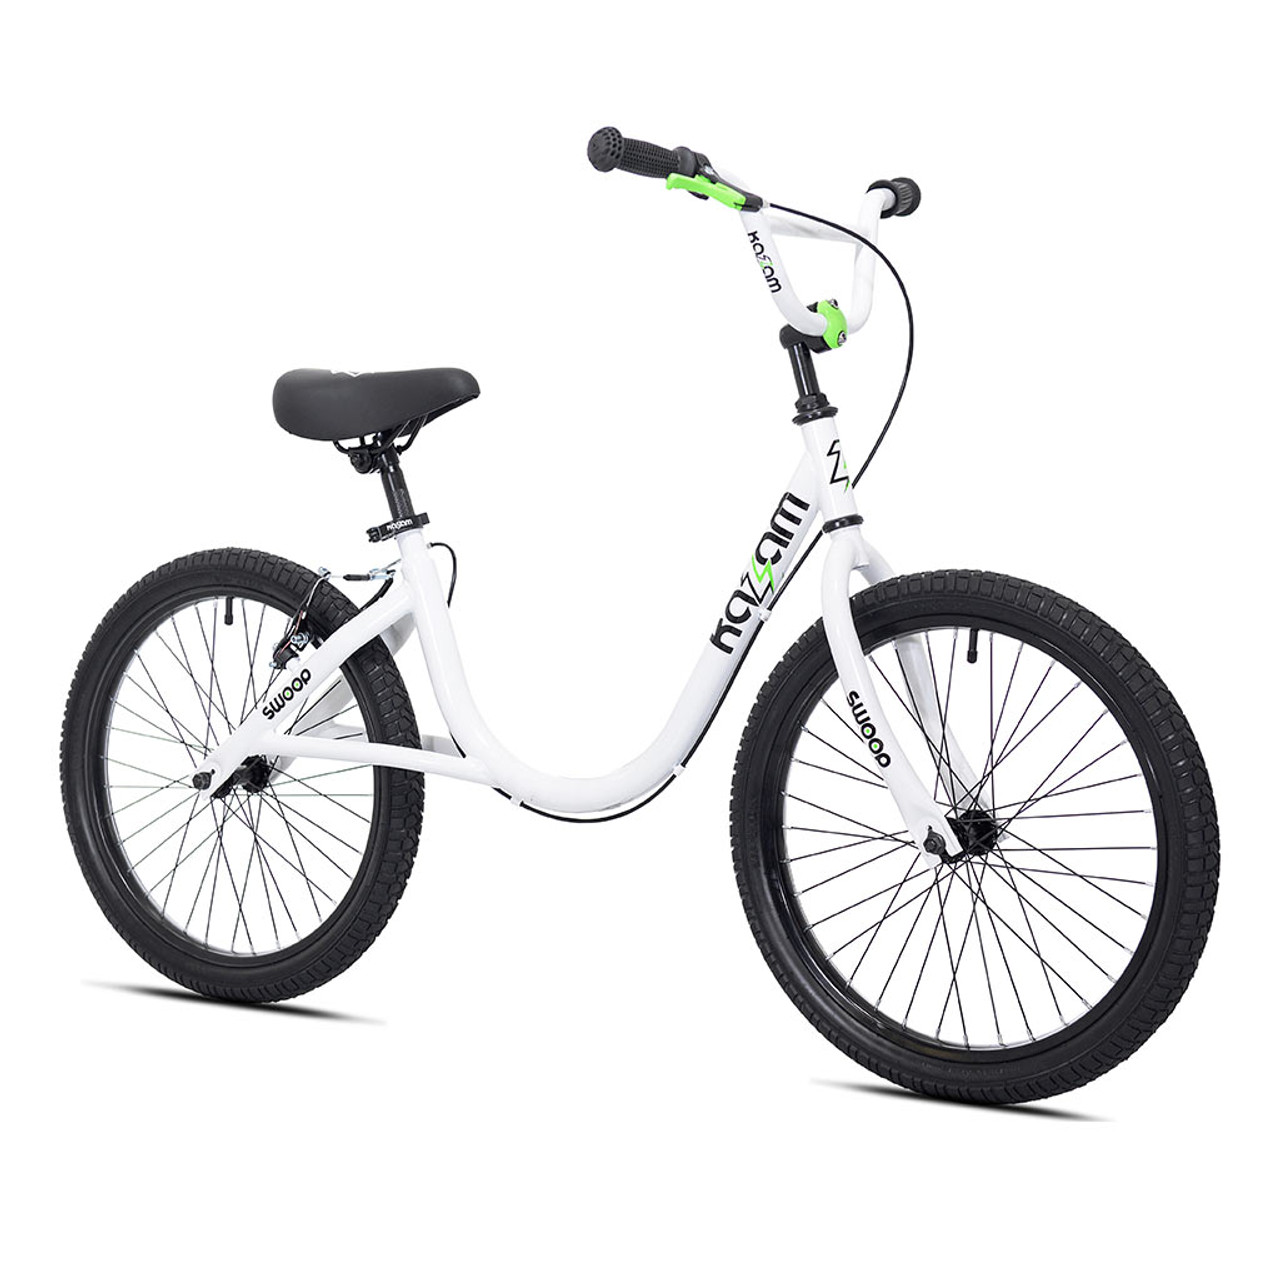 White Swoop Balance Bike